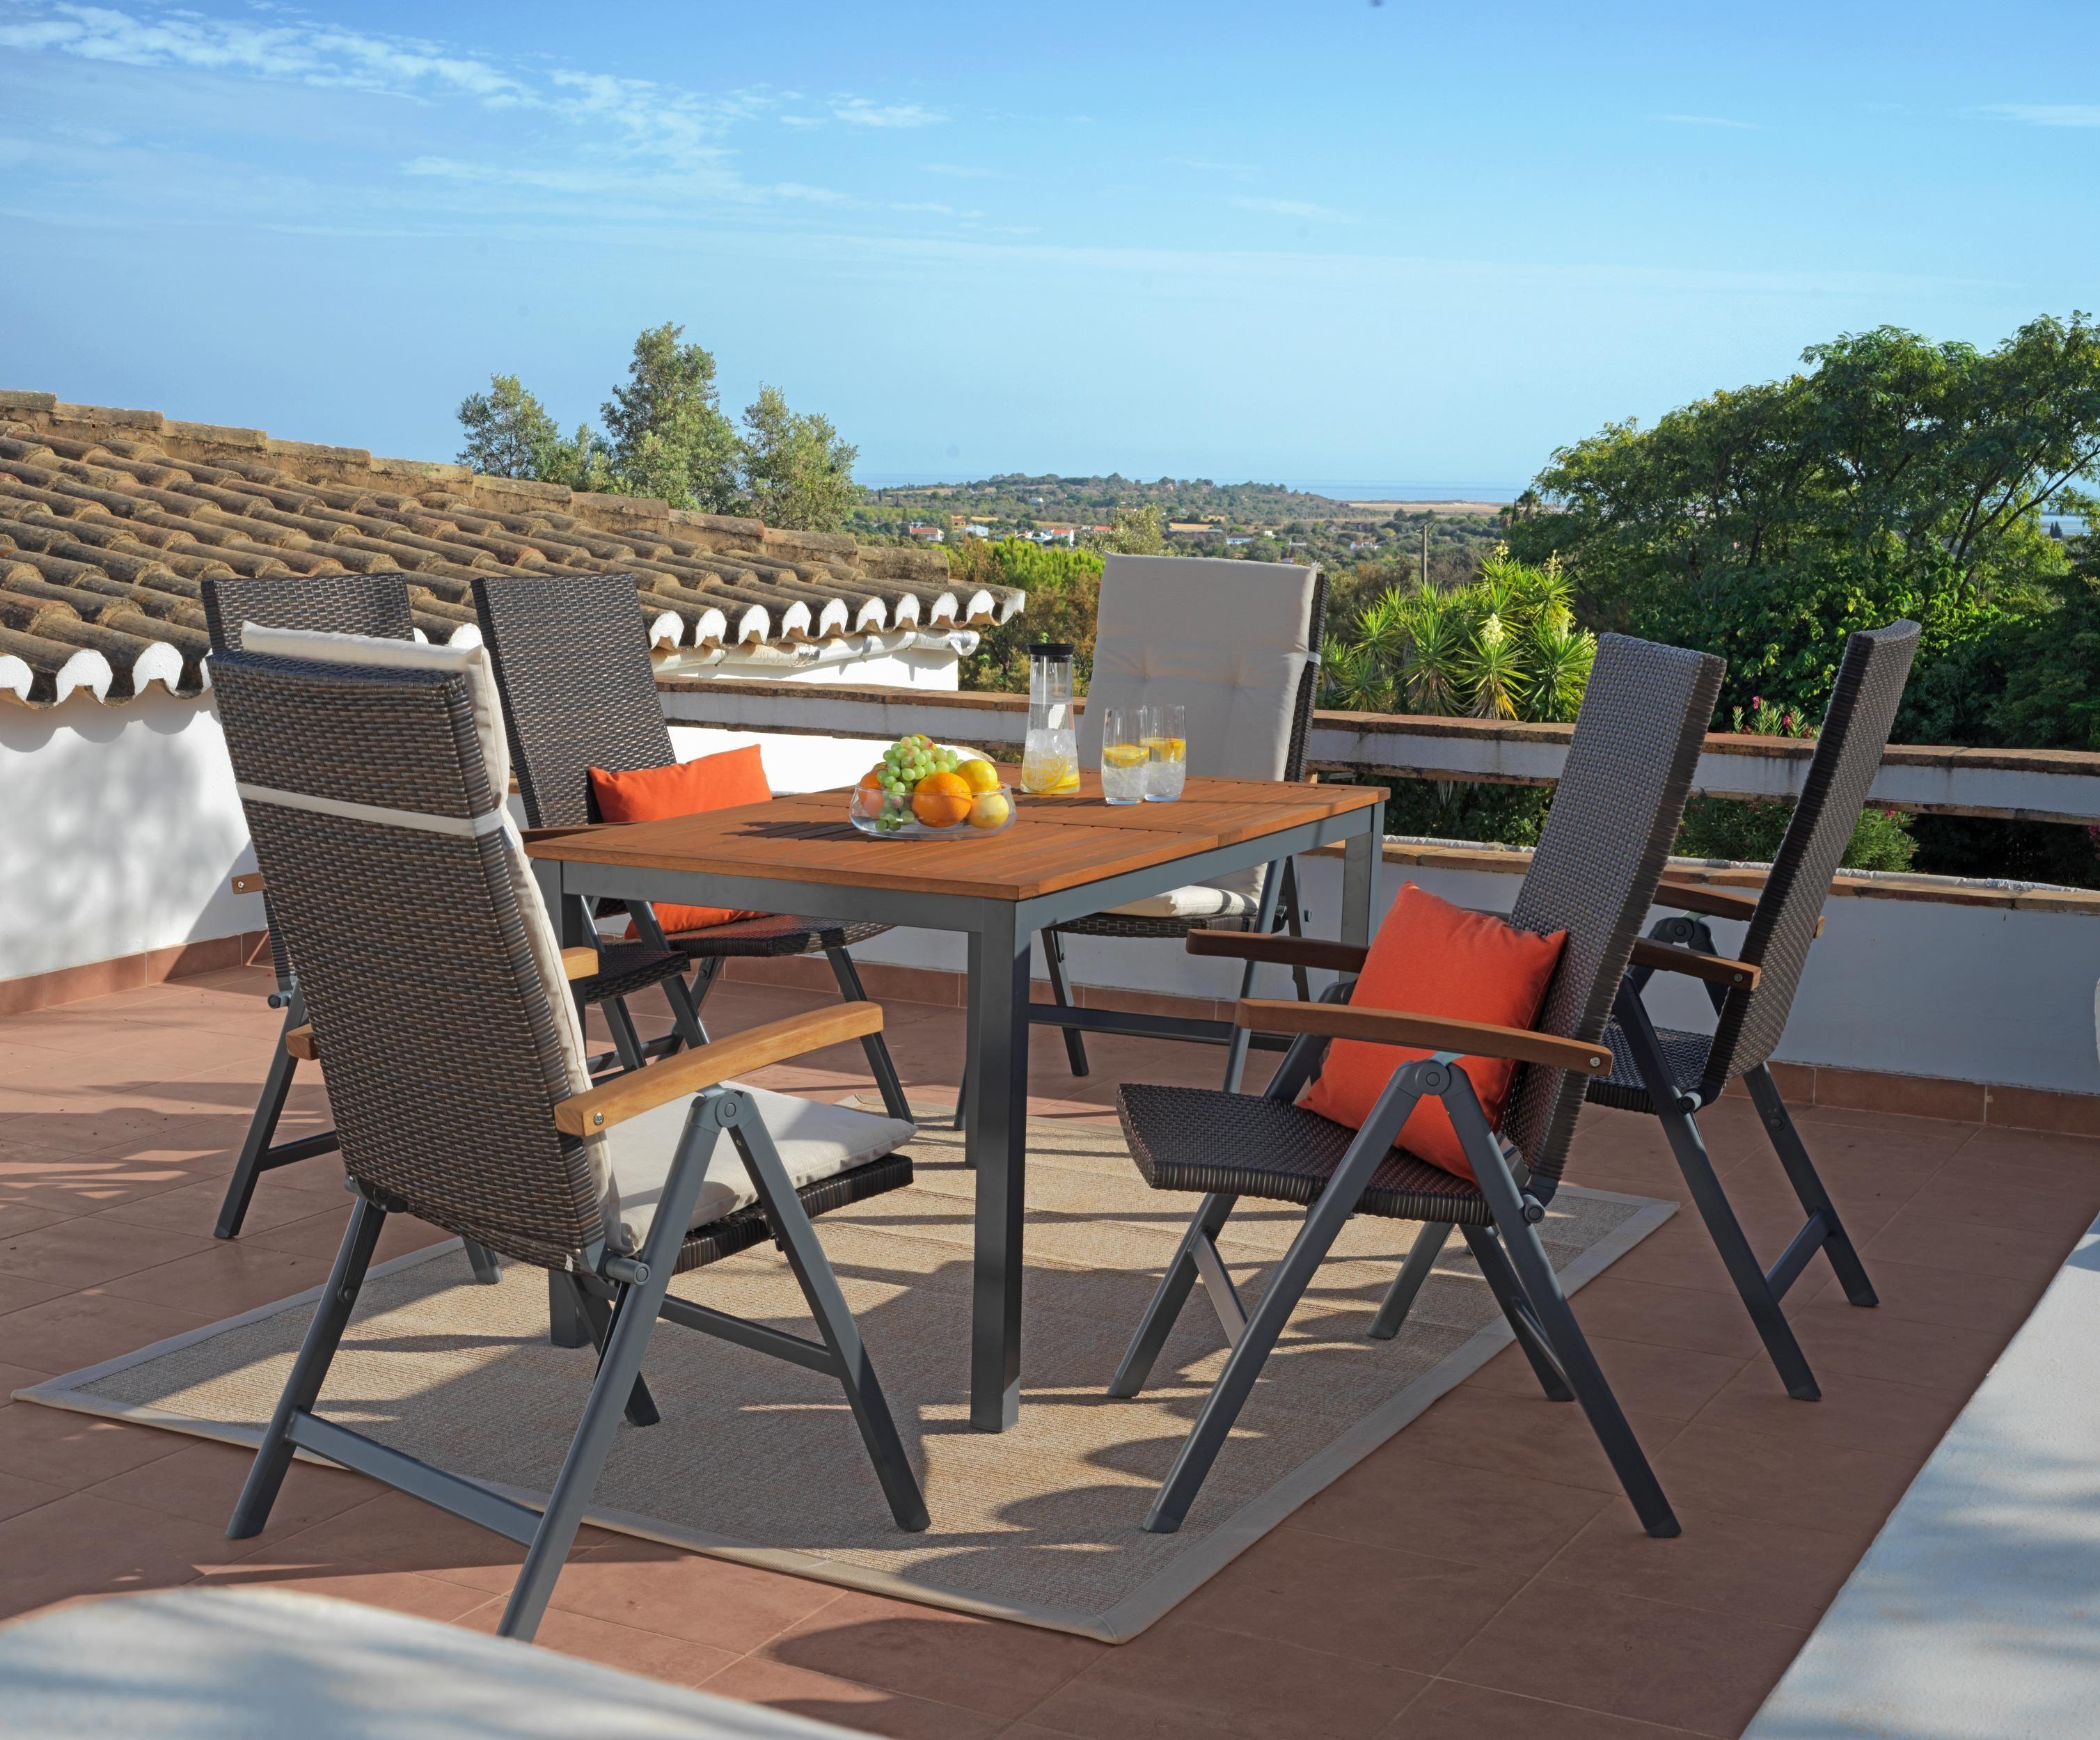 Sitzgruppe Mit Klappbaren Garten Stuhlen Gartenmobel Balkonmobel Lounge Mobel